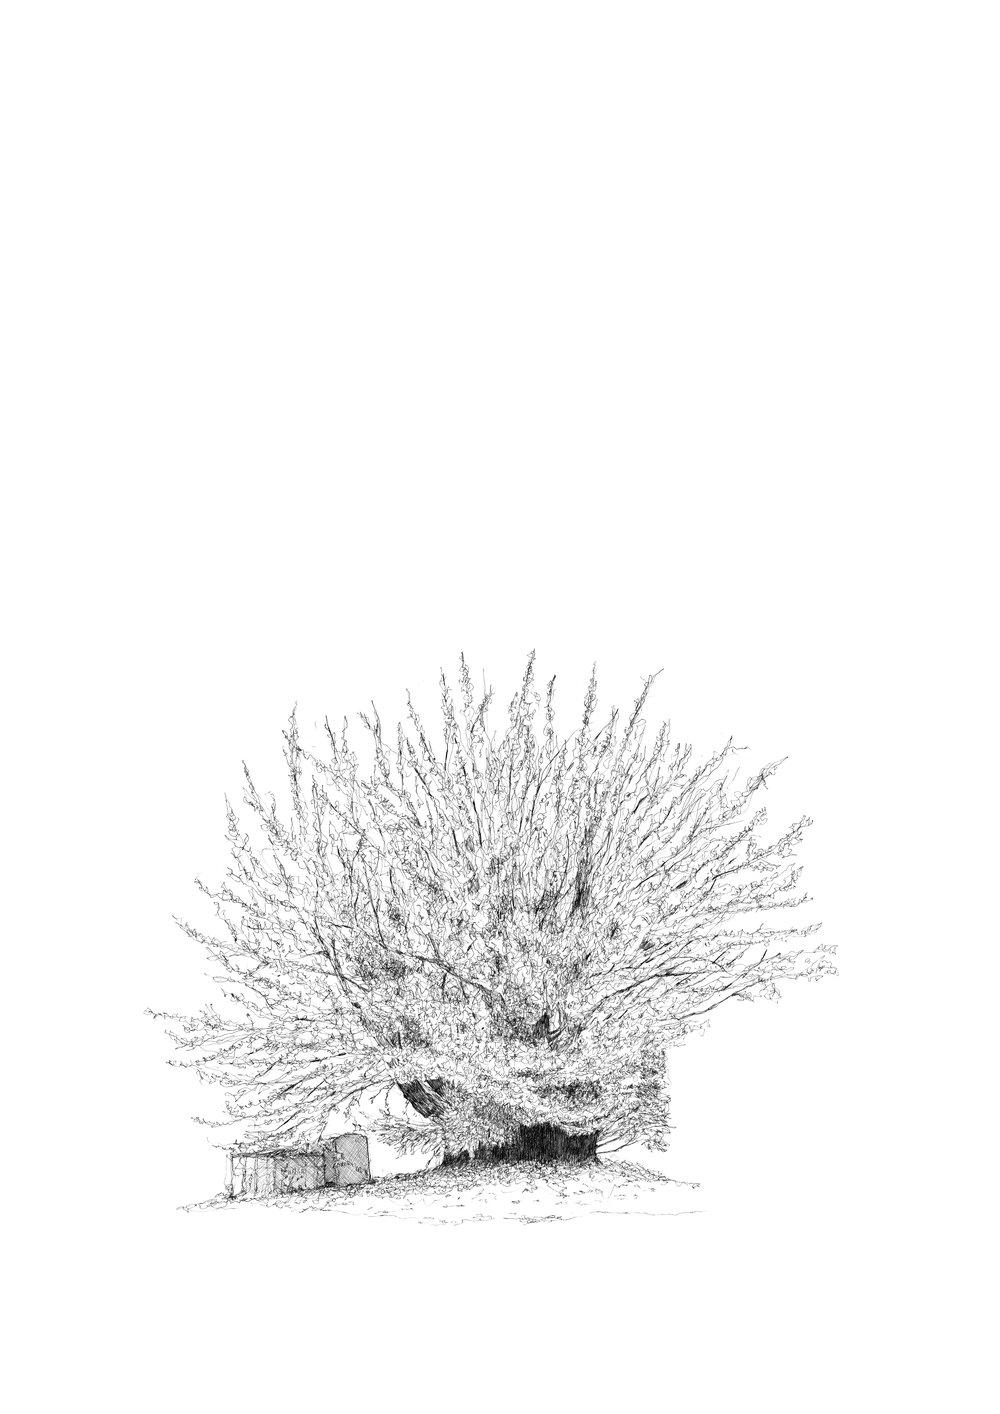 The Totteridge Yew Tree - Luke Adam Hawker